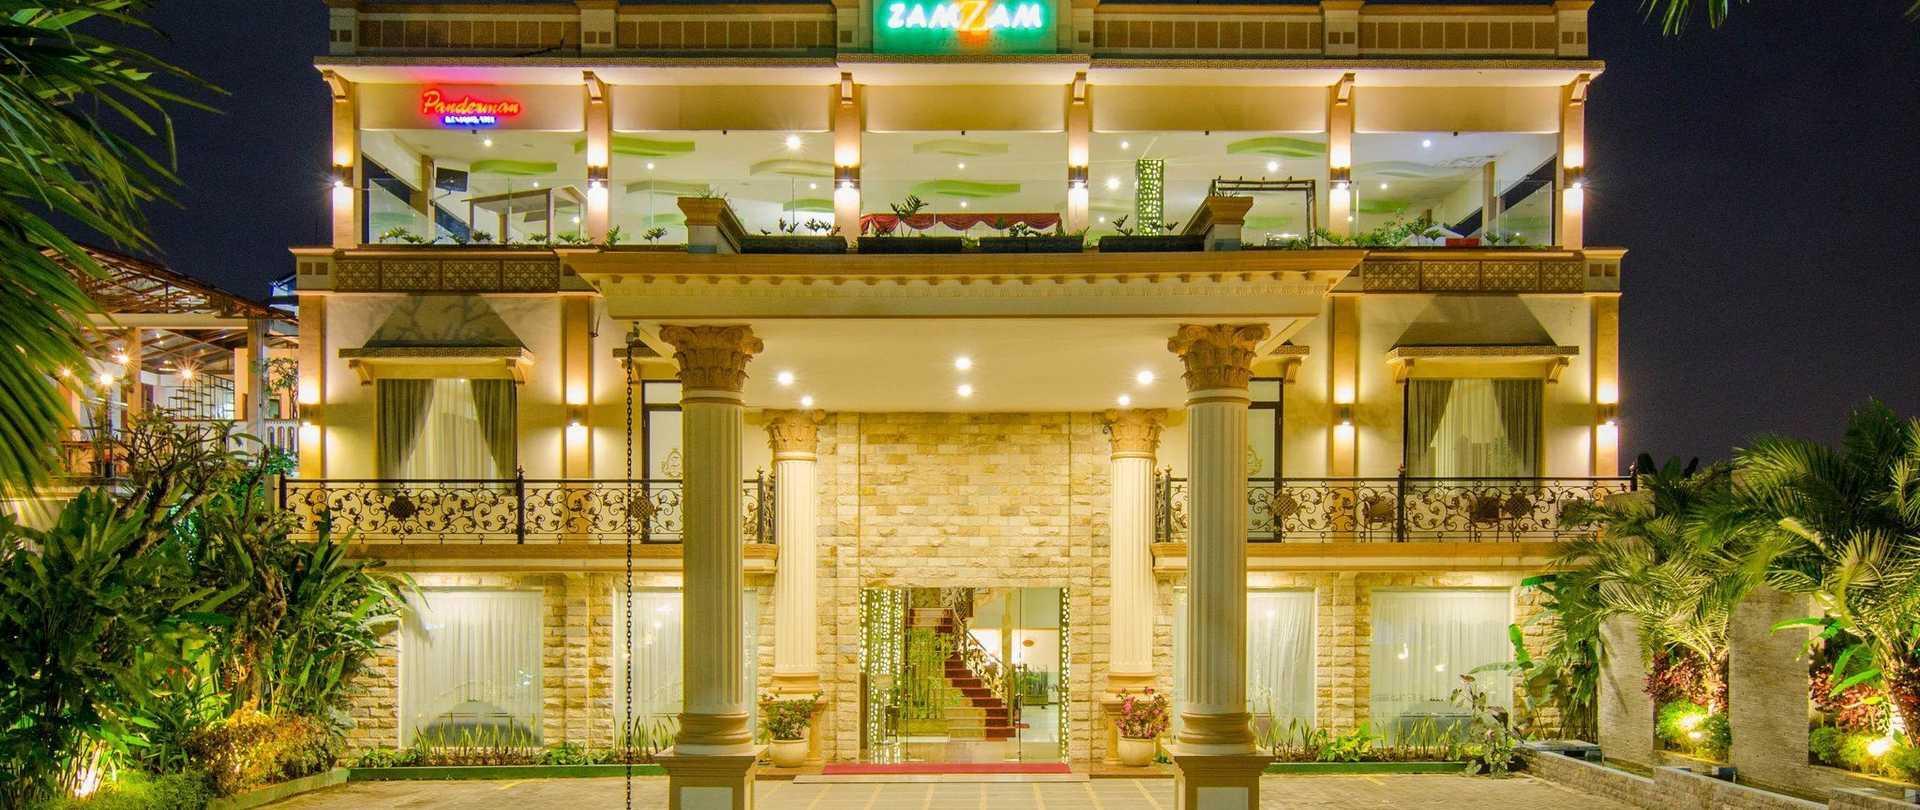 Zam Zam Hotel